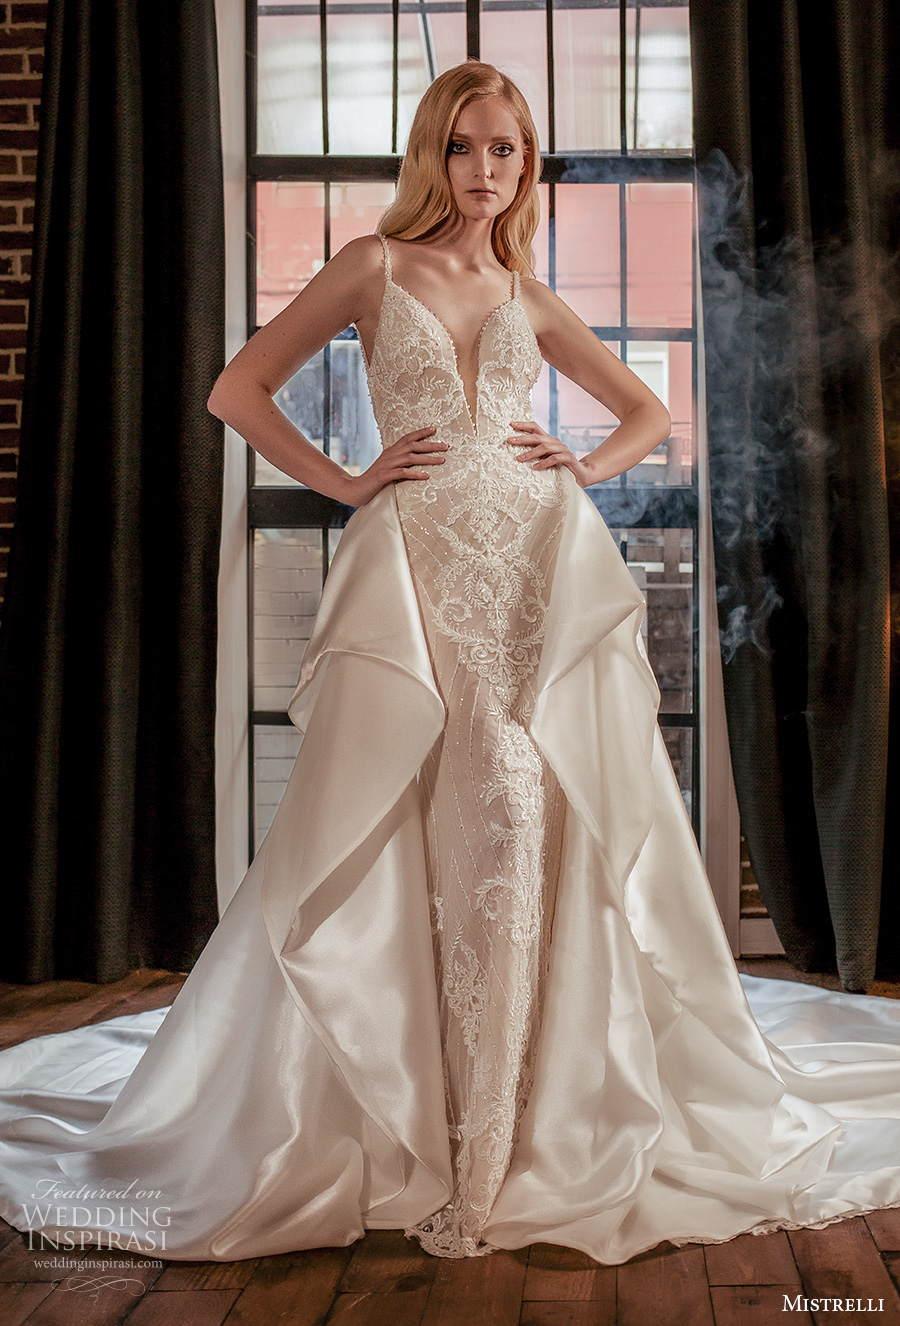 mistrelli 2021 royal drama bridal sleeveless thin strap deep sweetheart neckline full embellishment glamorous sheath wedding dress a  line overskirt backless low back chapel train (9) mv